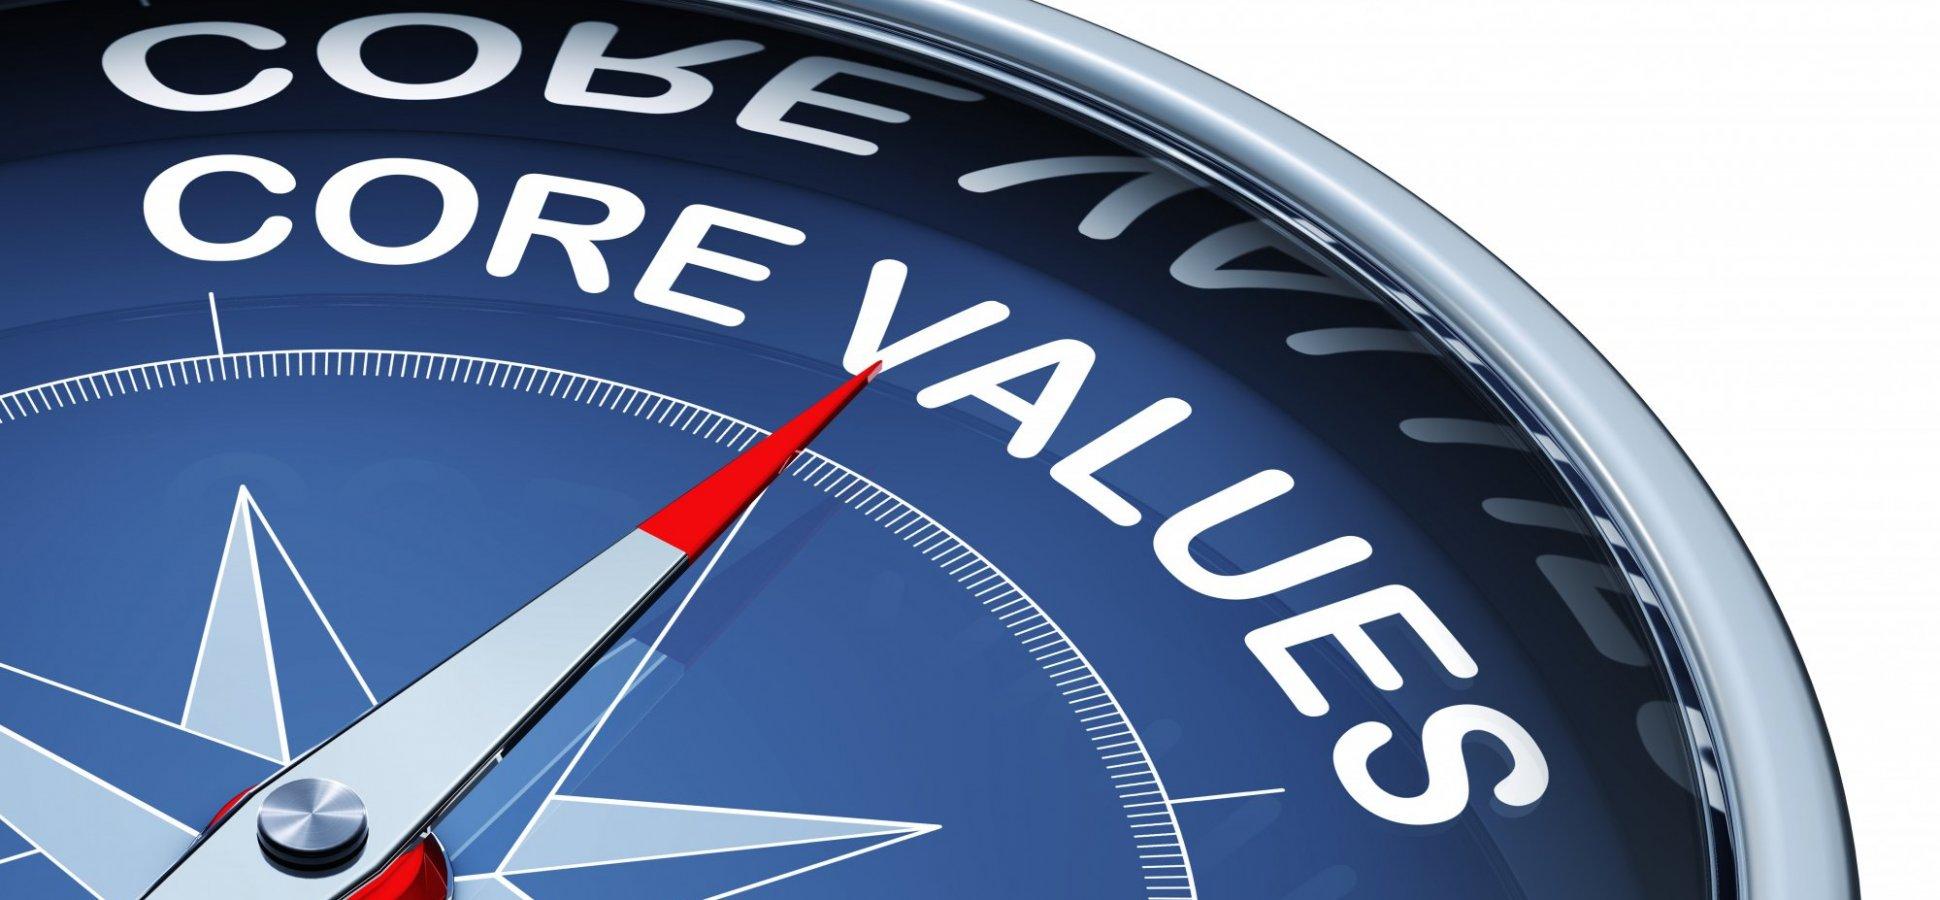 Core Values: The Best Kept Secret of True High Performance